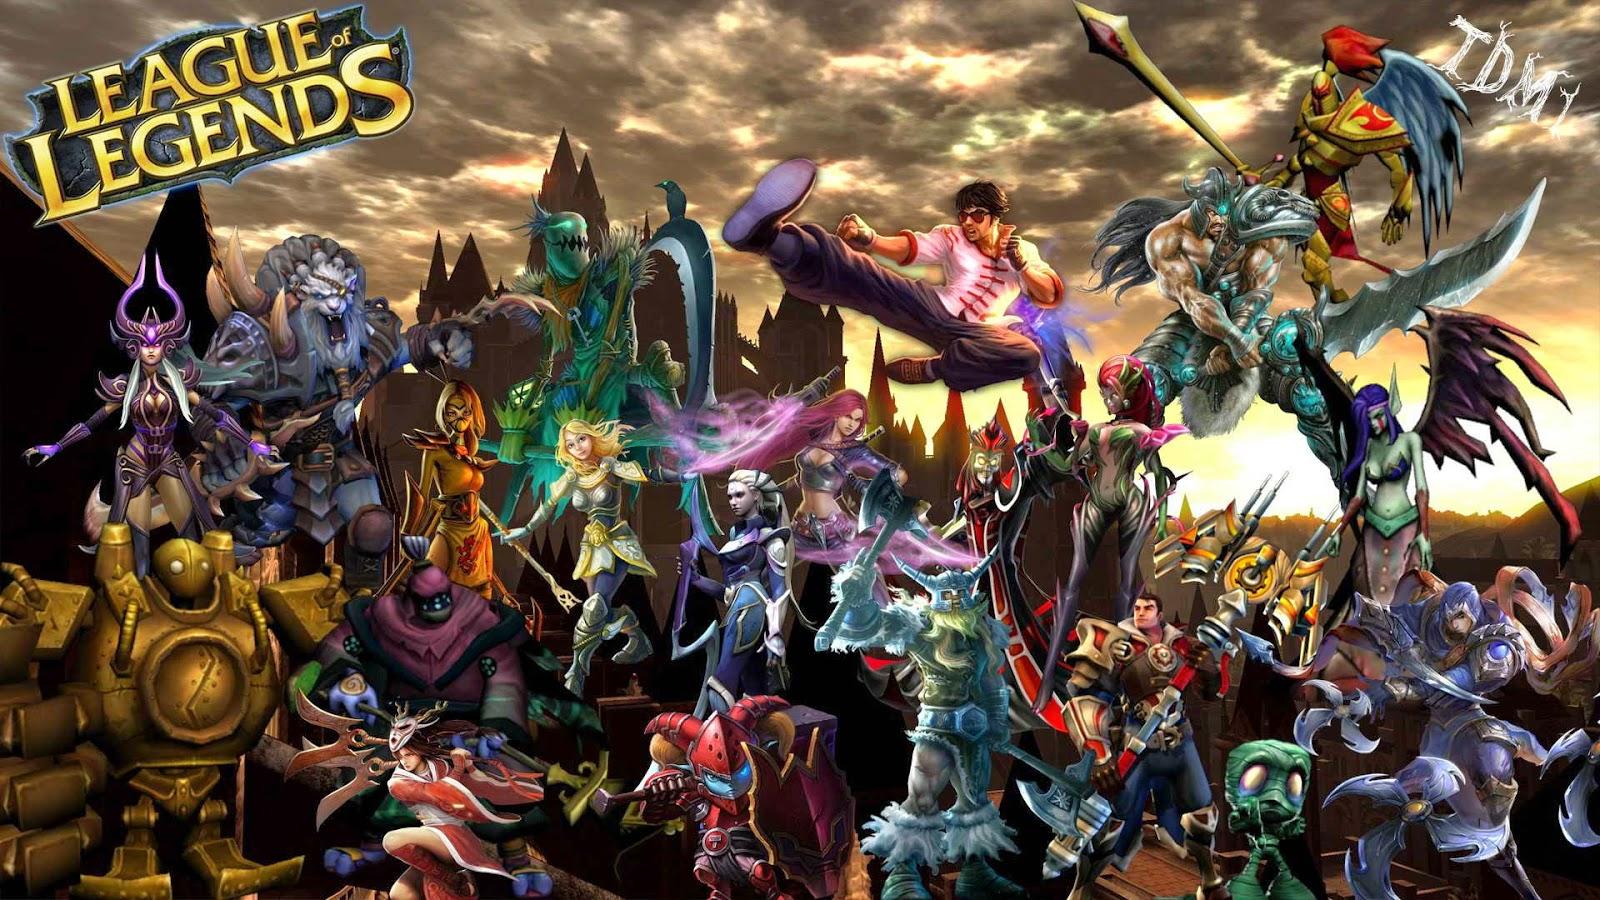 League of Legends hd wallpaper by hdwallsource